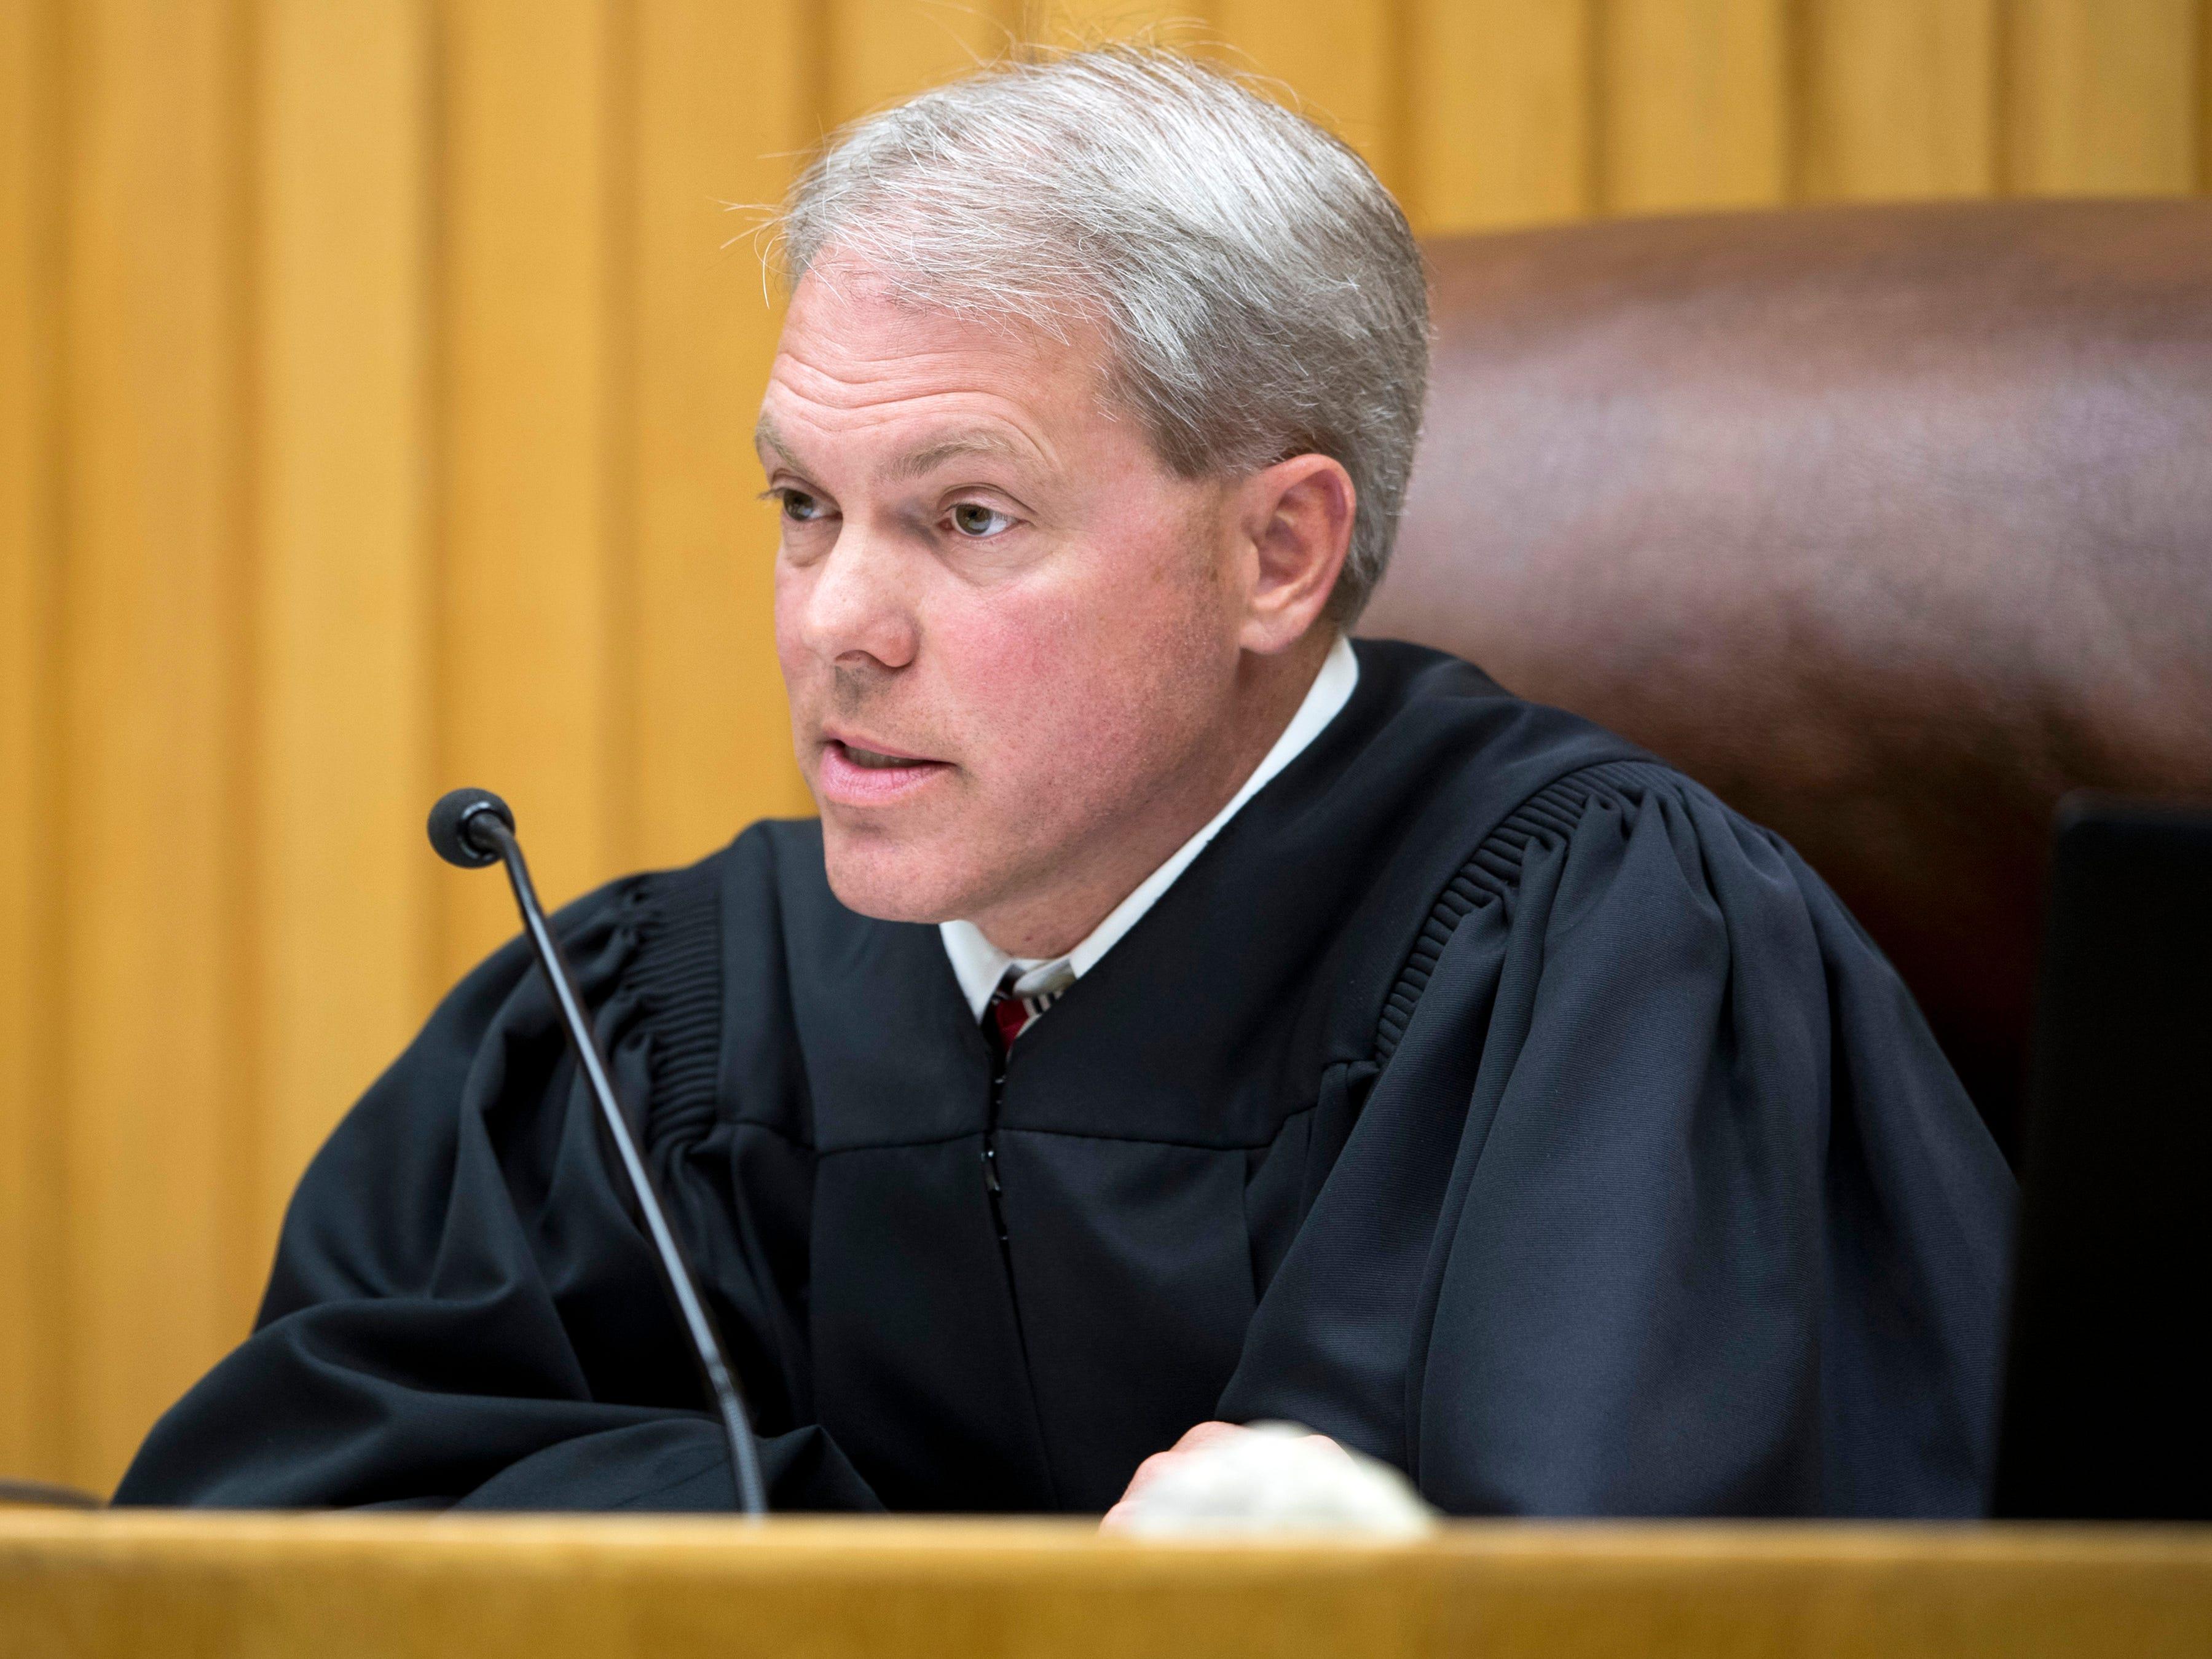 Judge Steve Sword during David Lynn Richards' sentencing hearing in Knox County Criminal Court on Thursday, May 9, 2019.